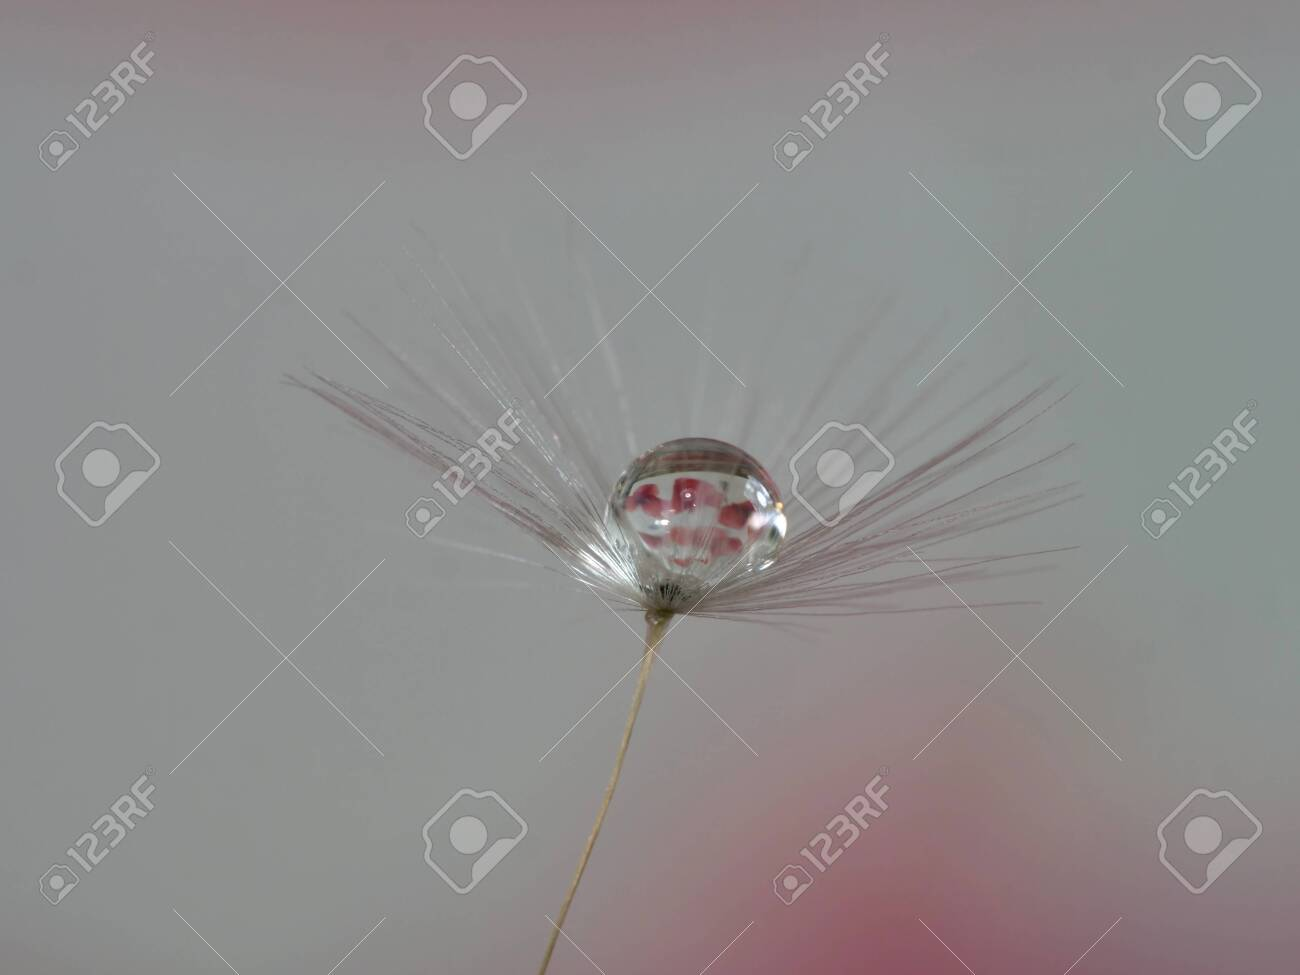 dandelion seed with water droplets macro - 146682771